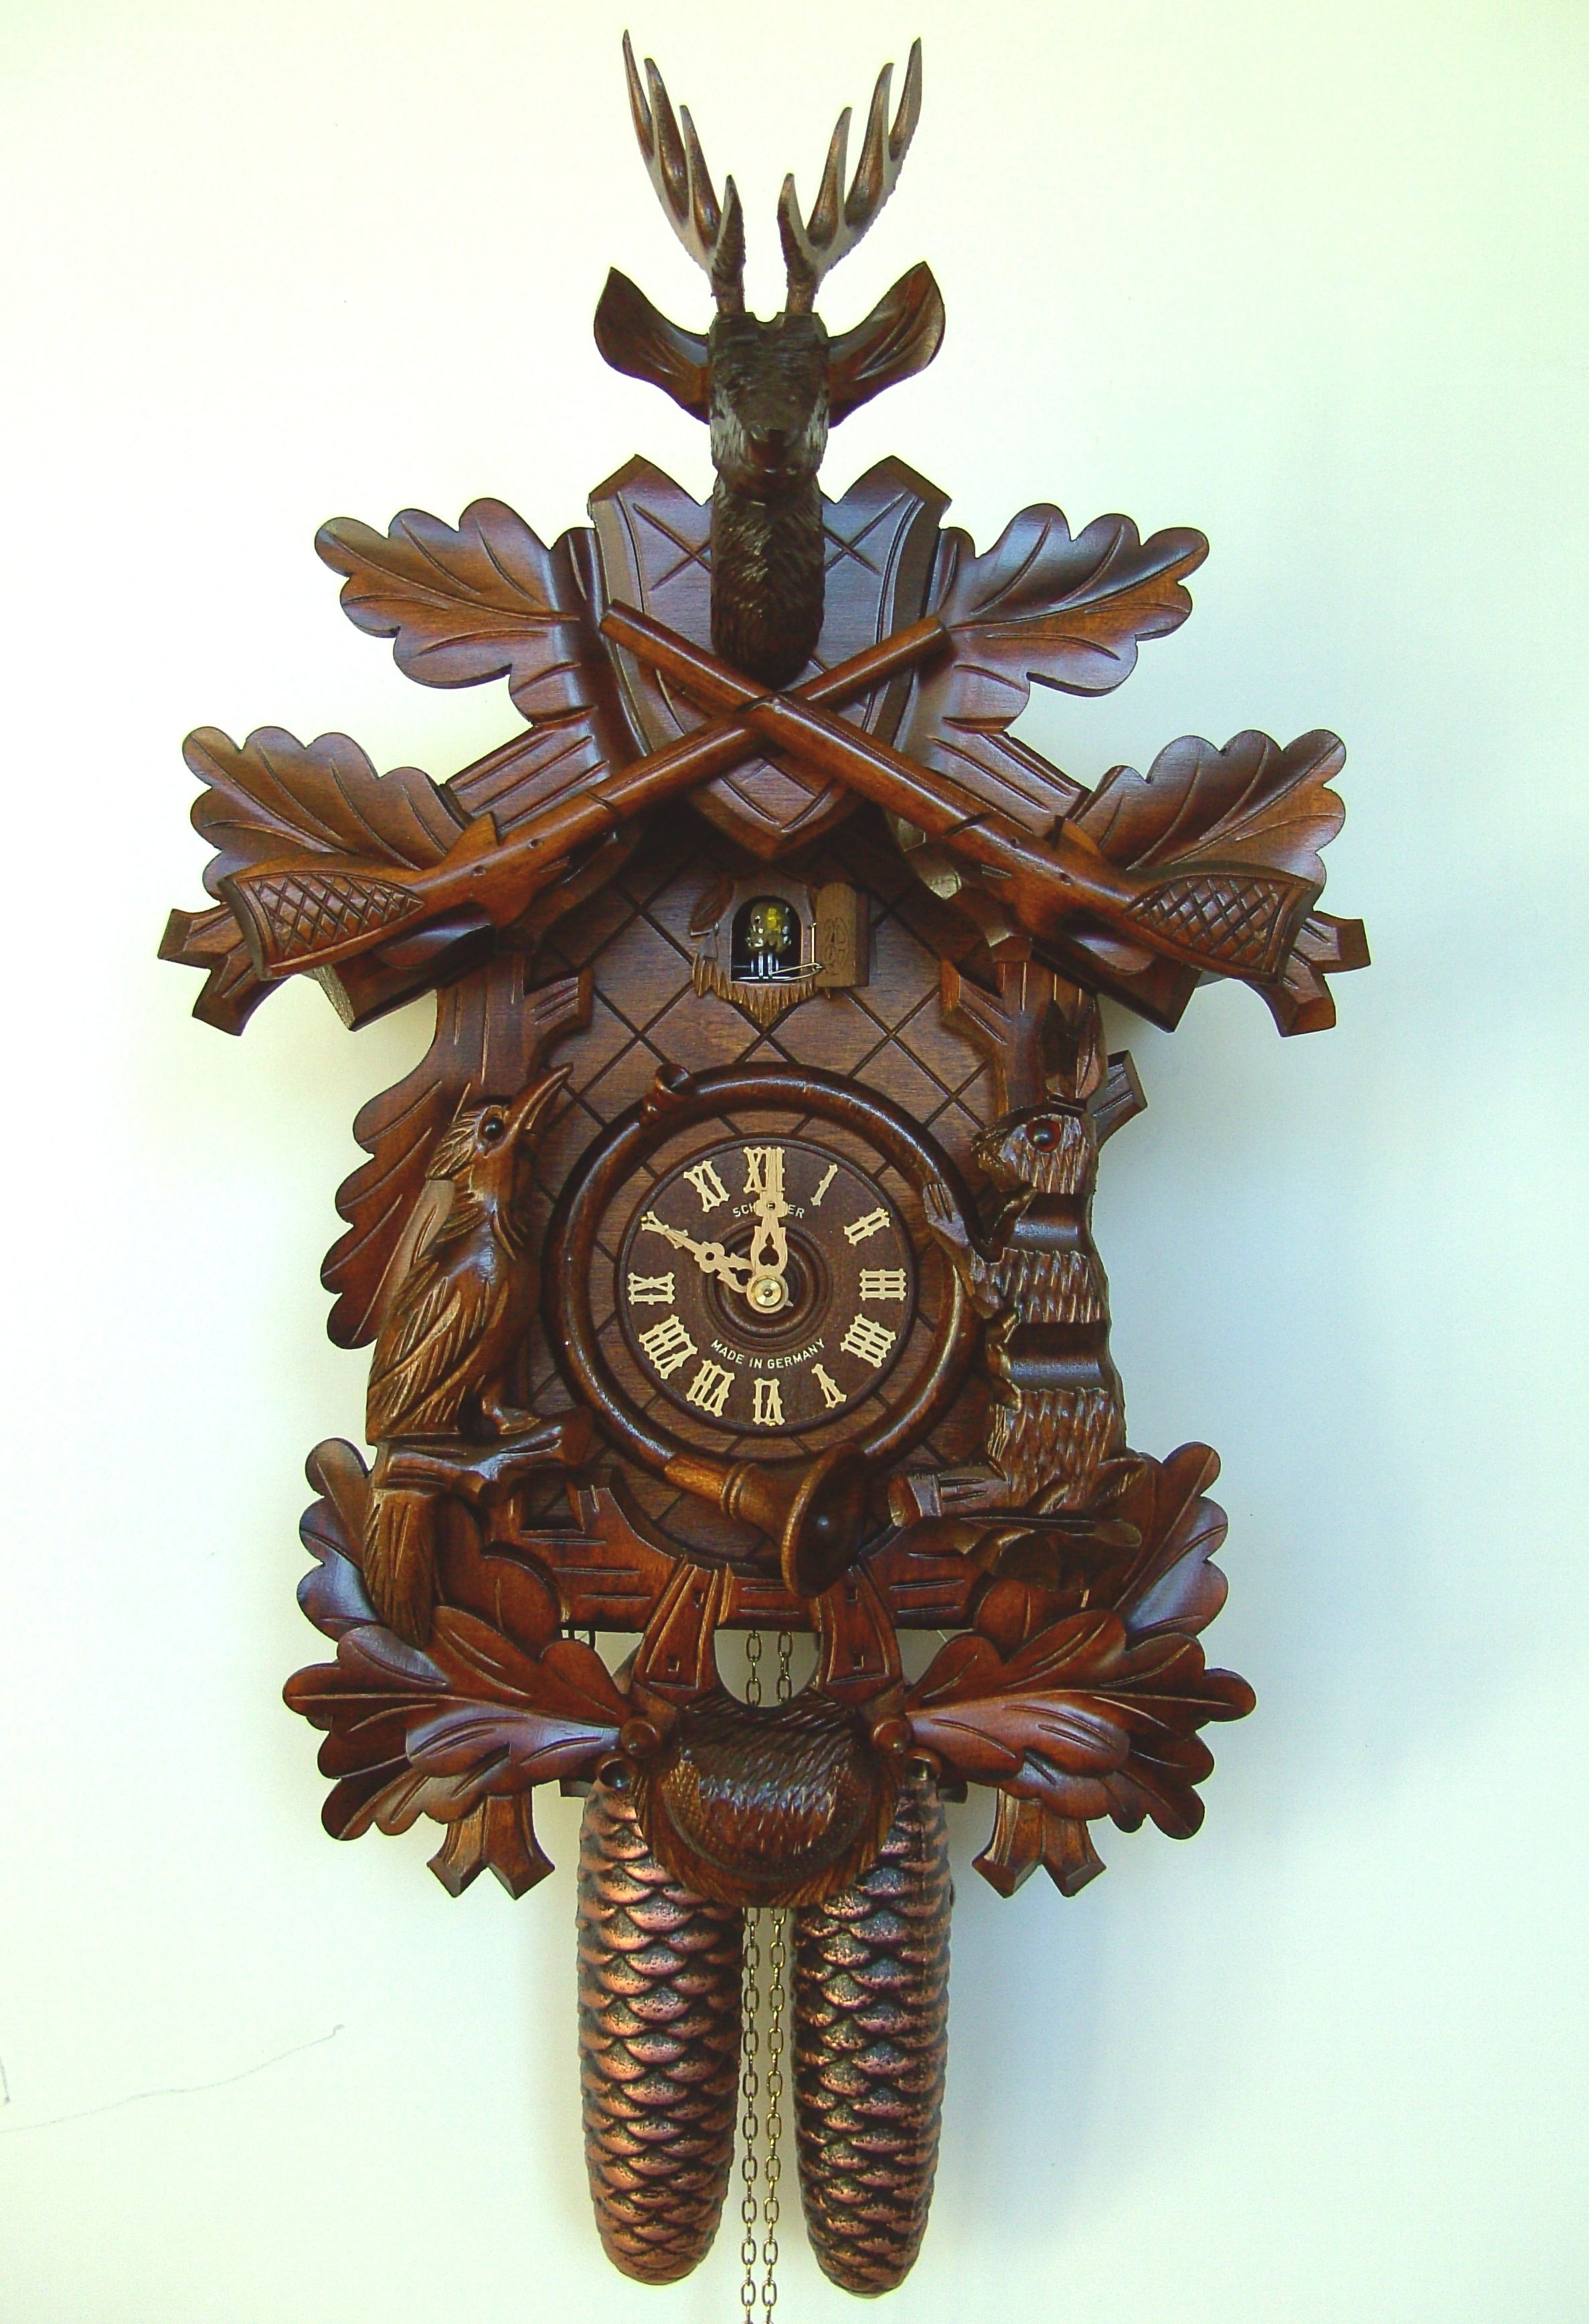 Anton schneider 8 day 1 wind hunting deer hare bird 8t 215 9 cuckoo clocks anton and - Wooden cuckoo clocks ...